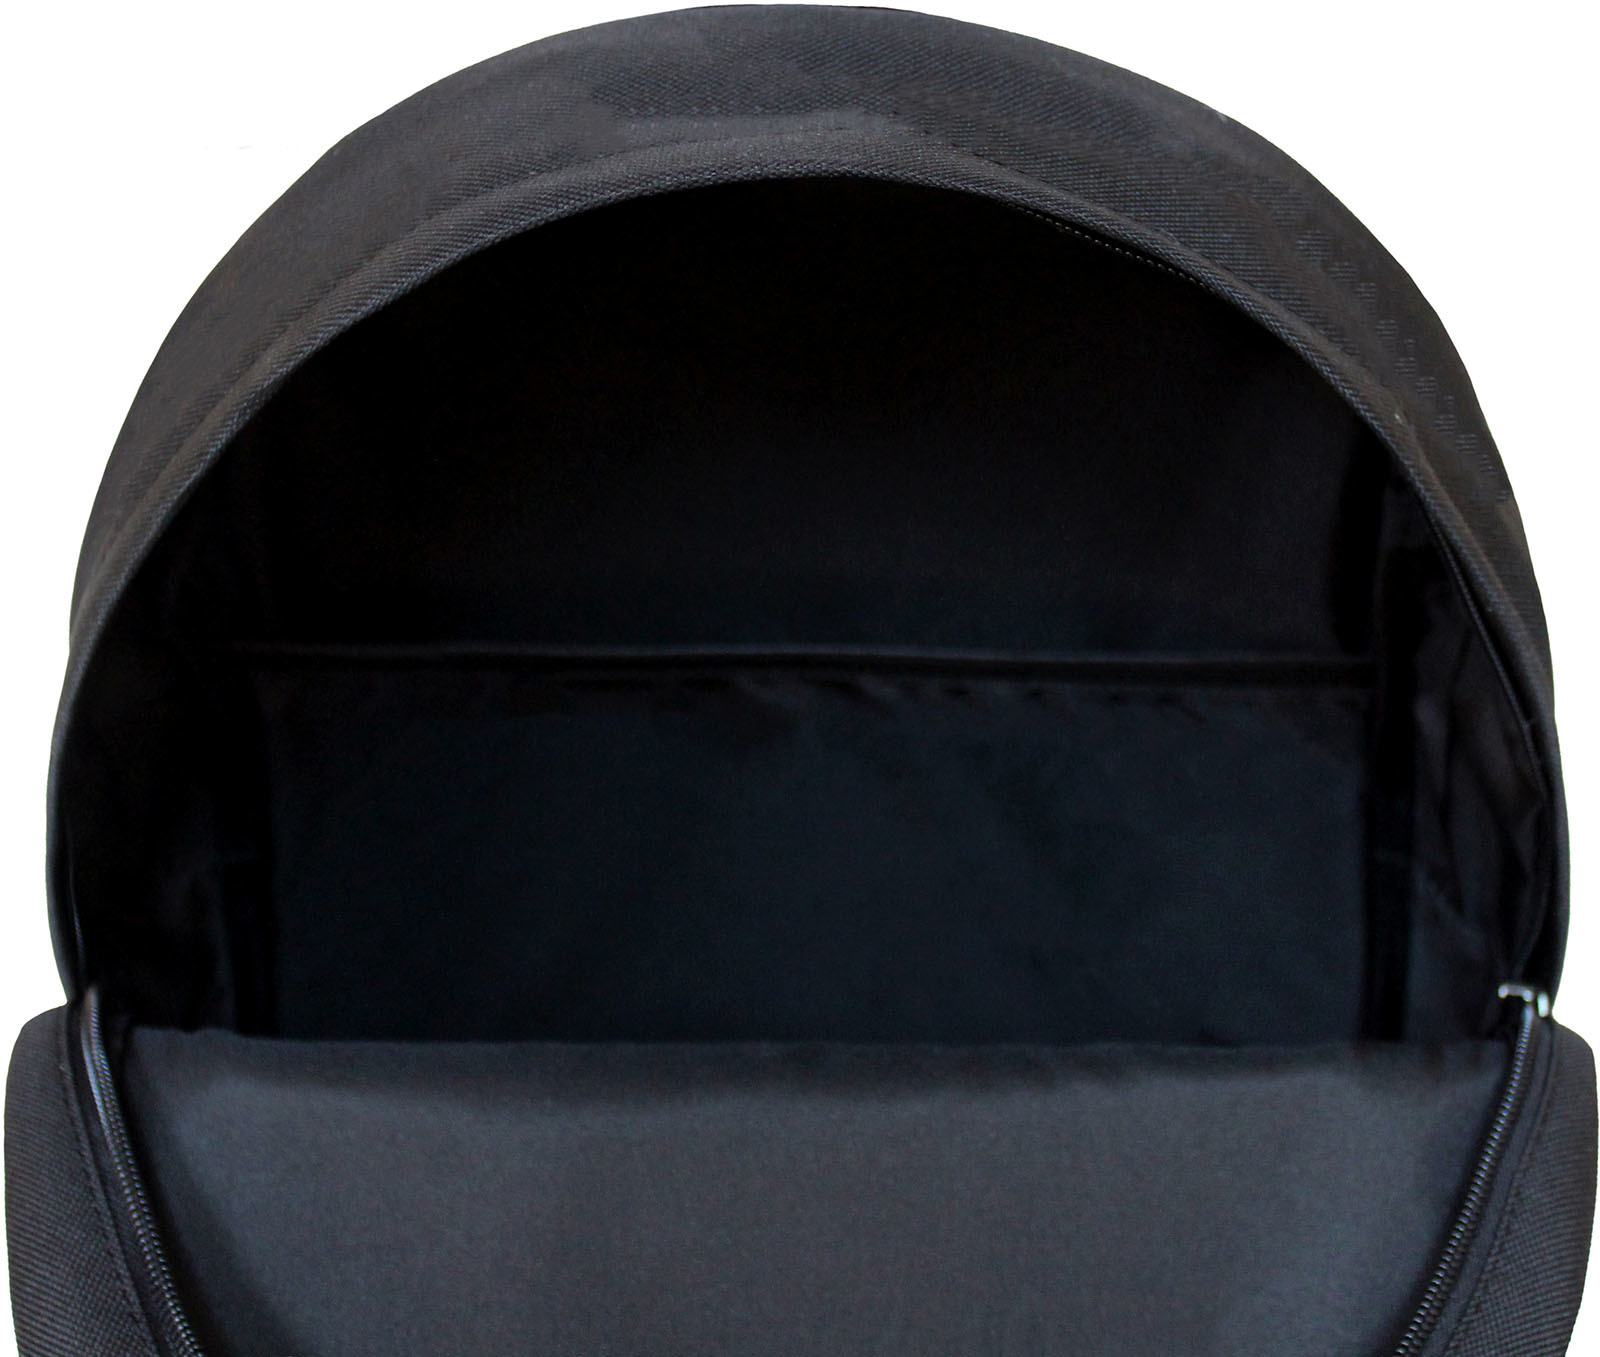 Рюкзак Bagland Молодежный W/R 17 л. черний 471 (00533662) фото 4